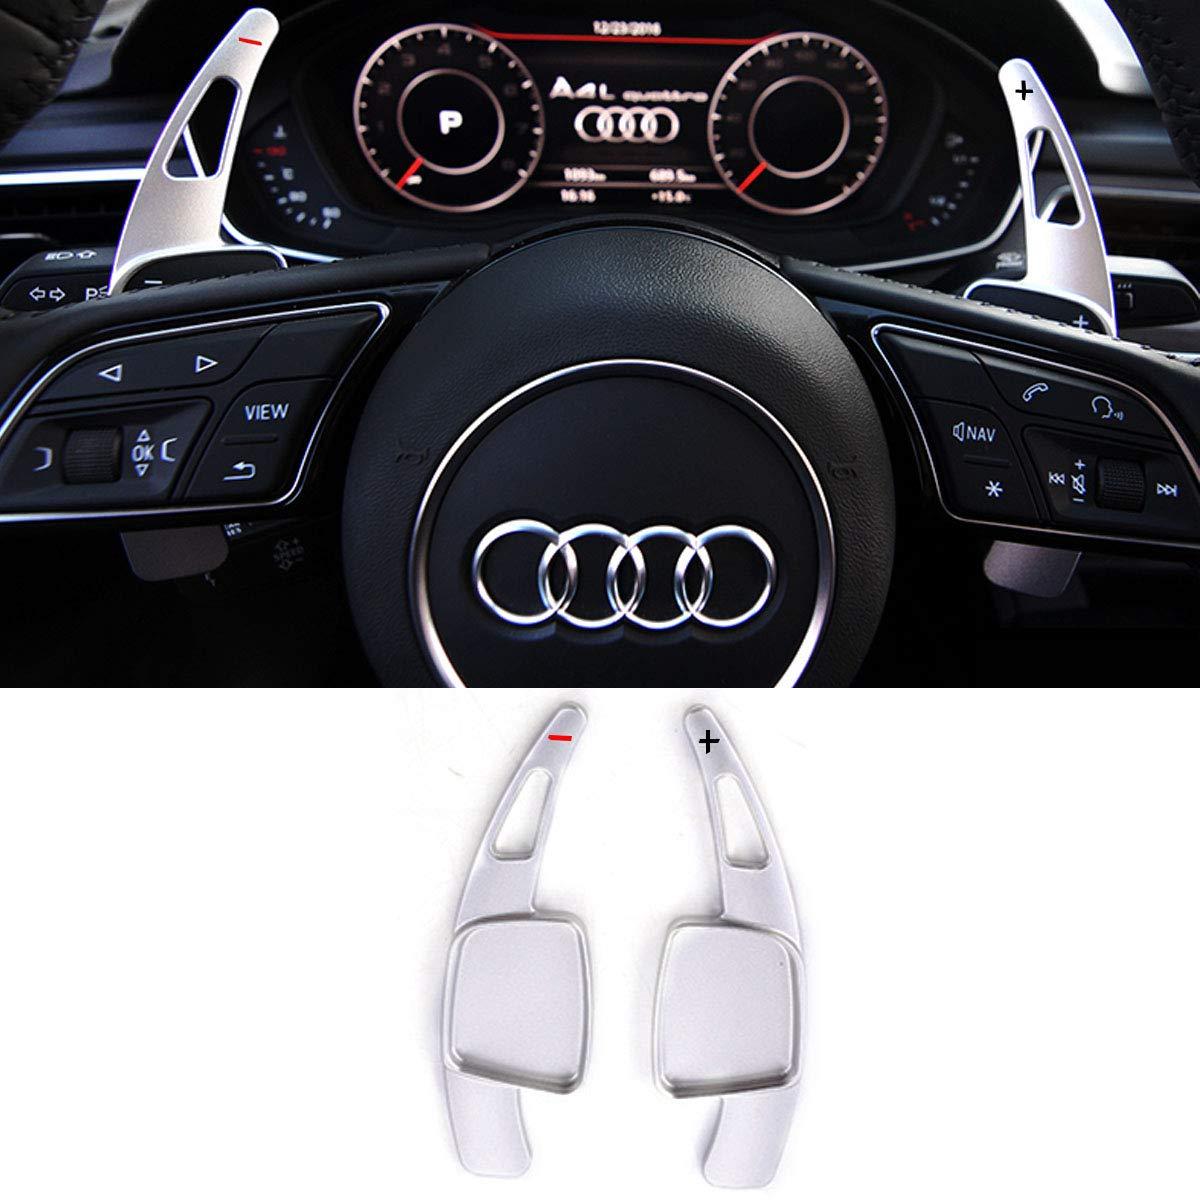 AUDI S A4 S4 A6 Q7 TT QUATTRO S line steering wheel matte STICKER EMBLEM fits